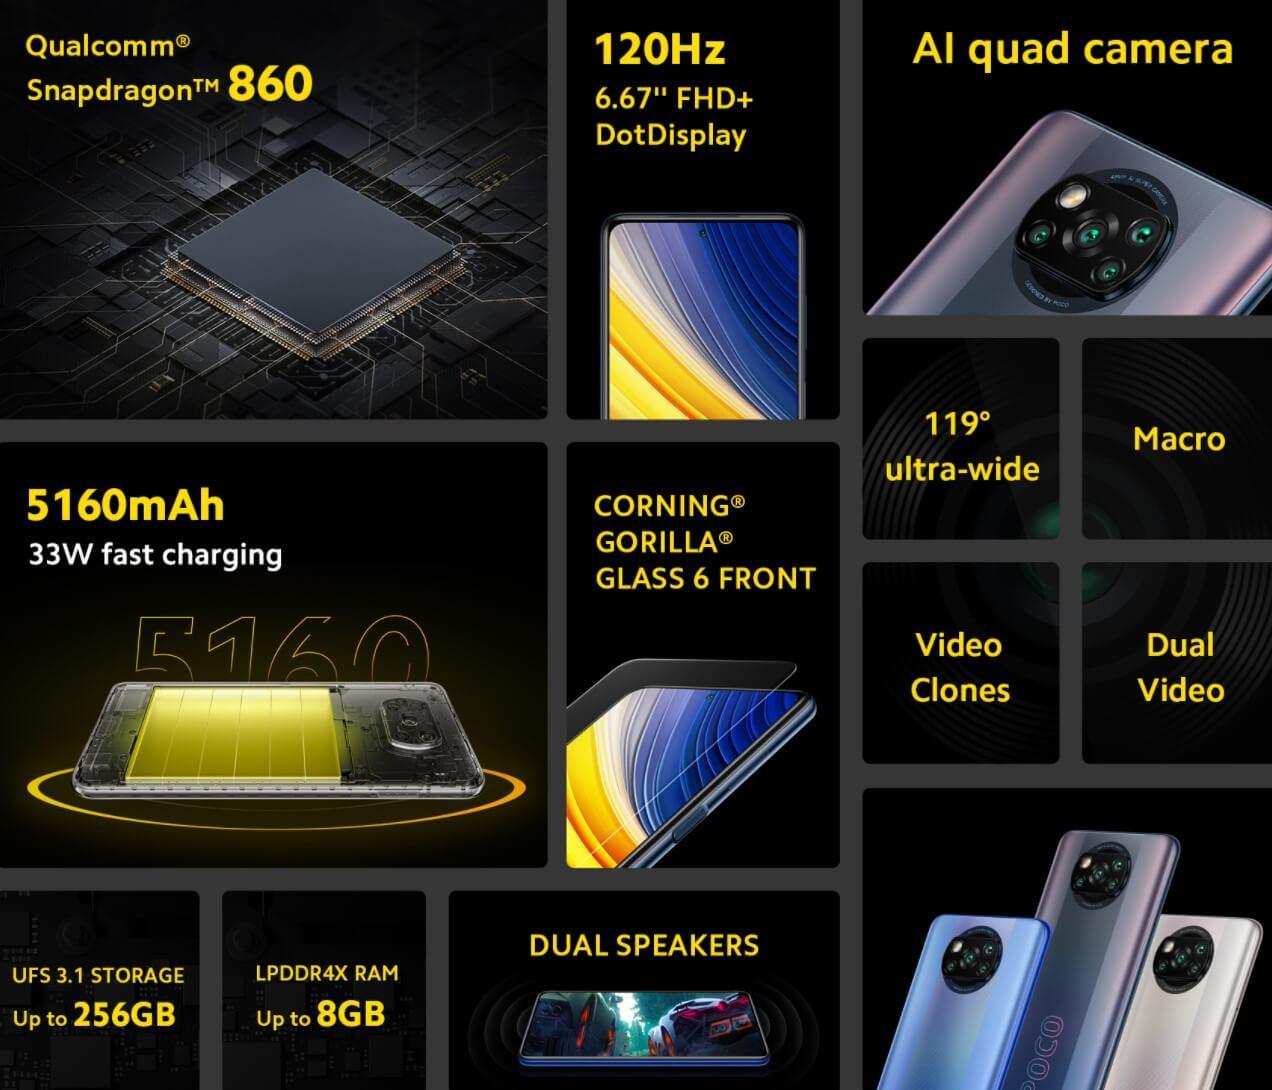 Xiaomi POCO X3 Proのディスプレイガラスはゴリラガラス6。ストレージはUFS3.1